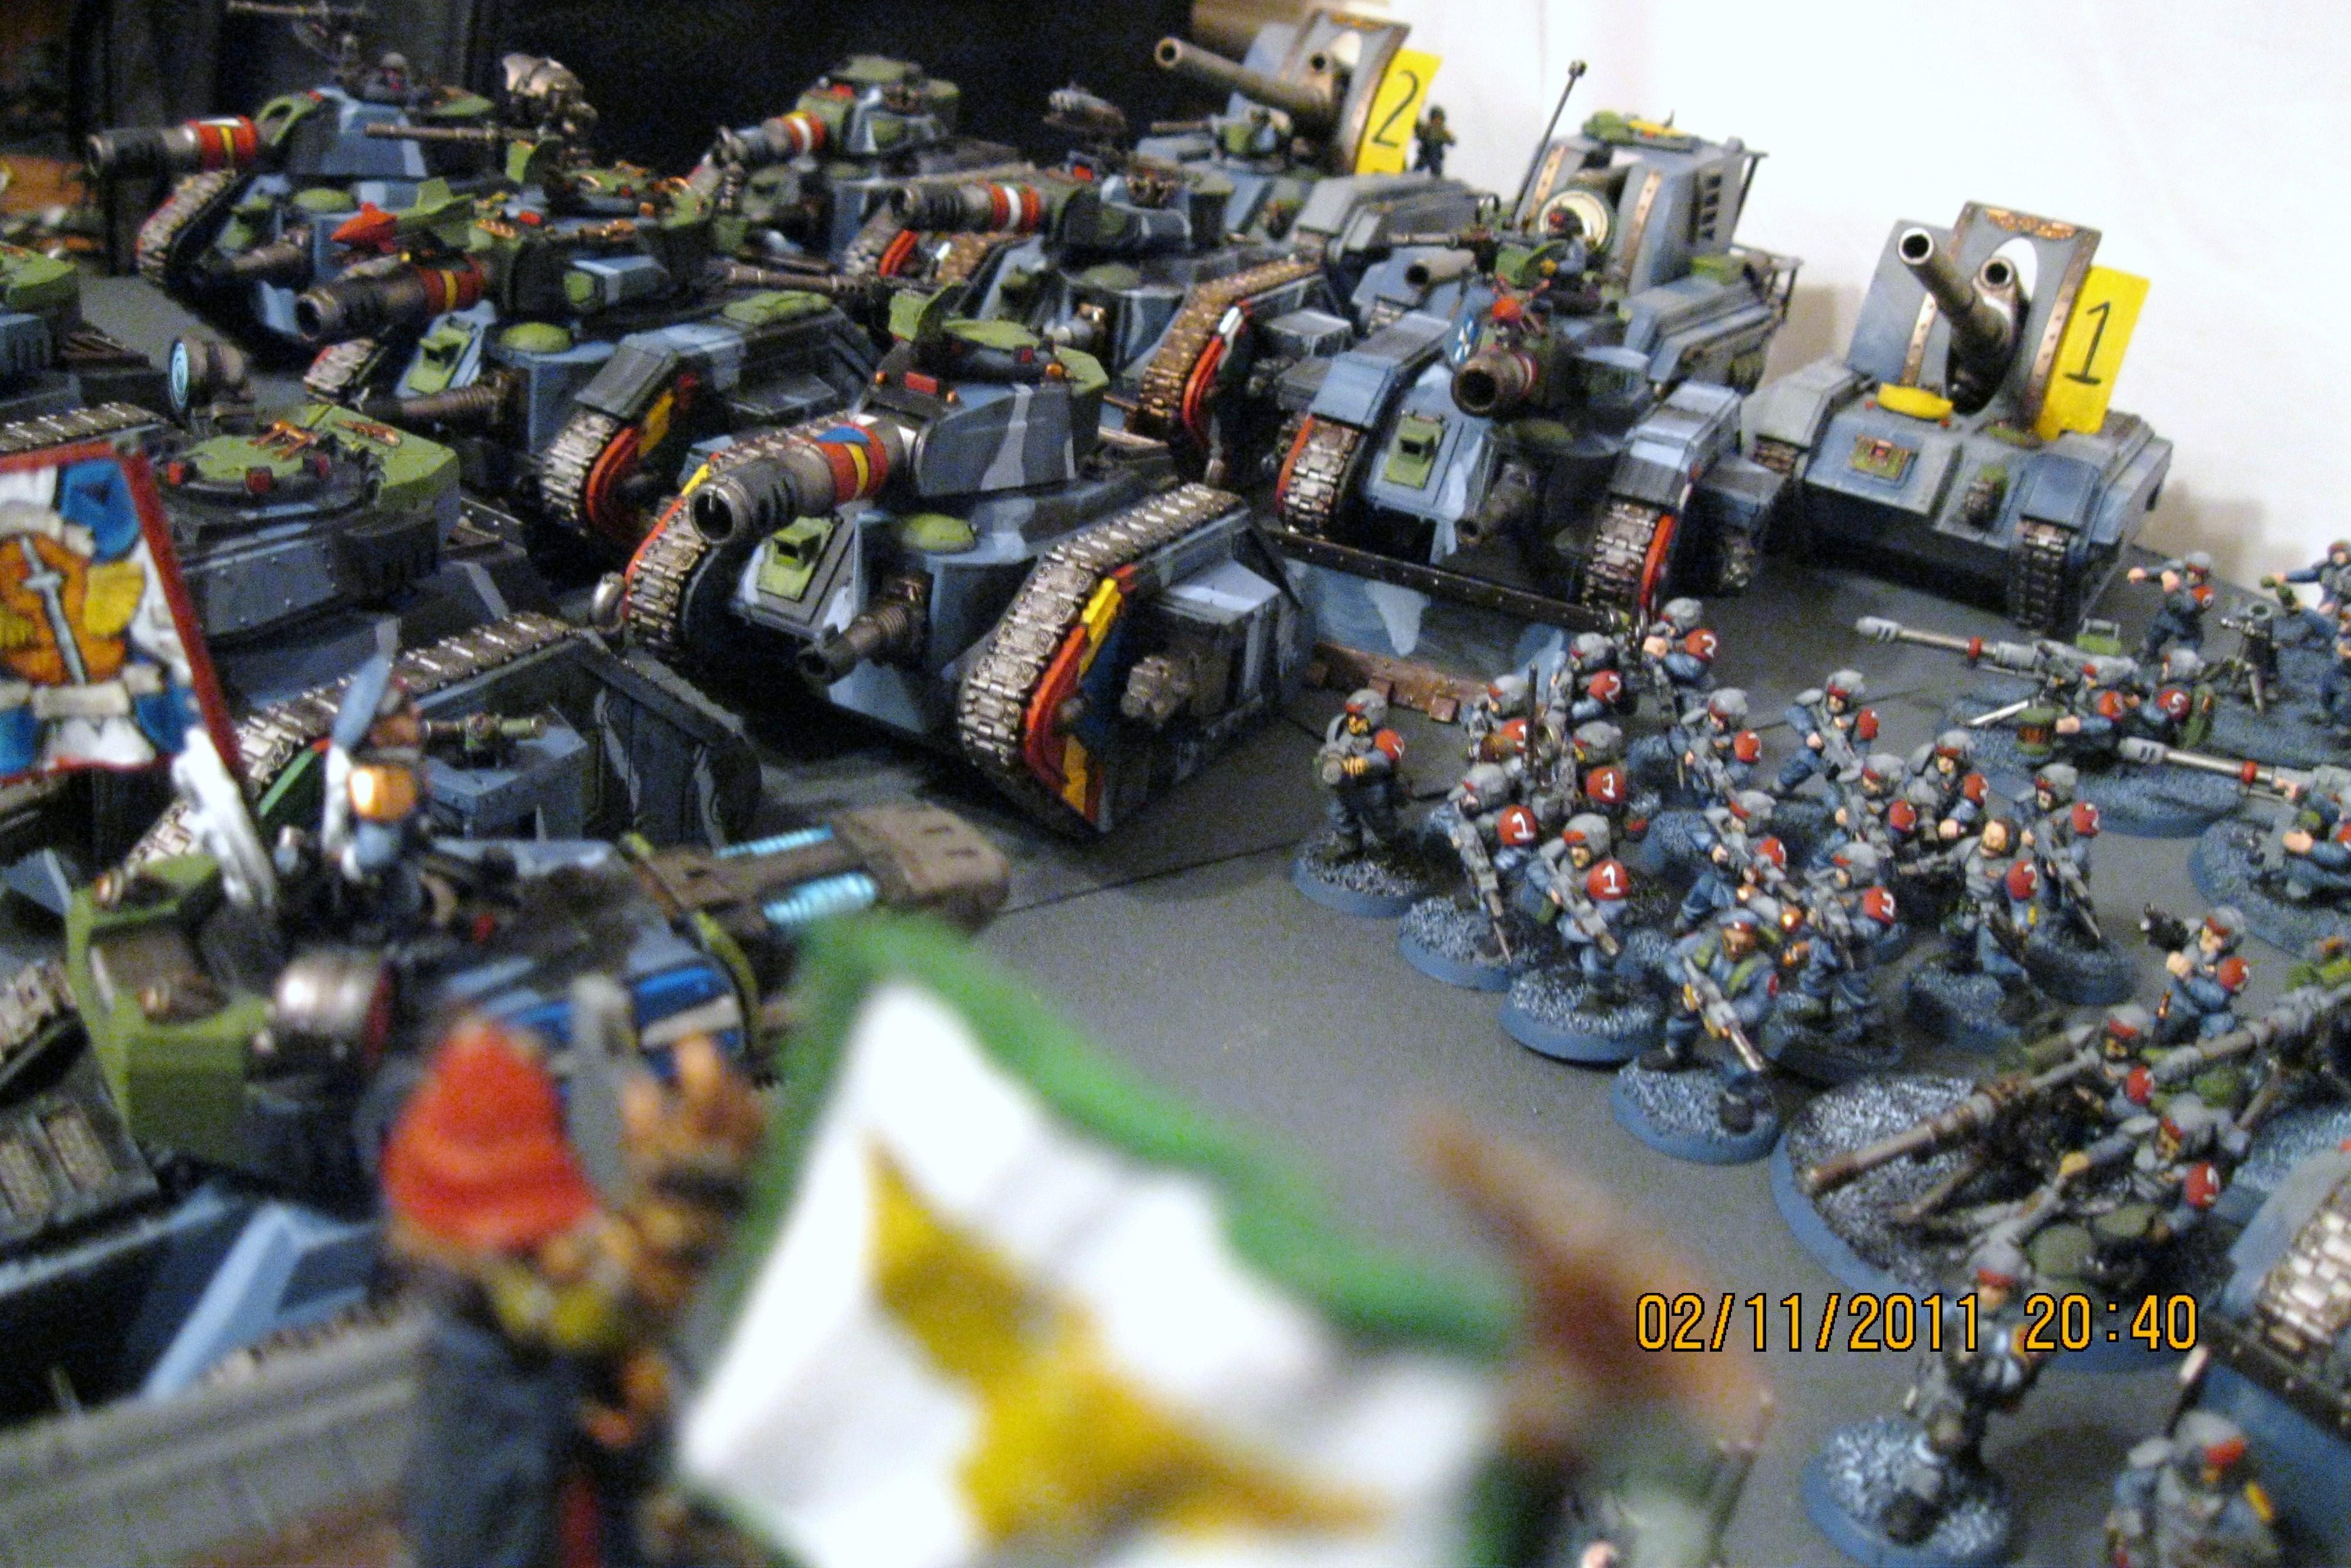 Apocalypse, Basilsks, Cadians, Imperial Guard, Infantry, Leman Russ, Tank, Warhammer 40,000